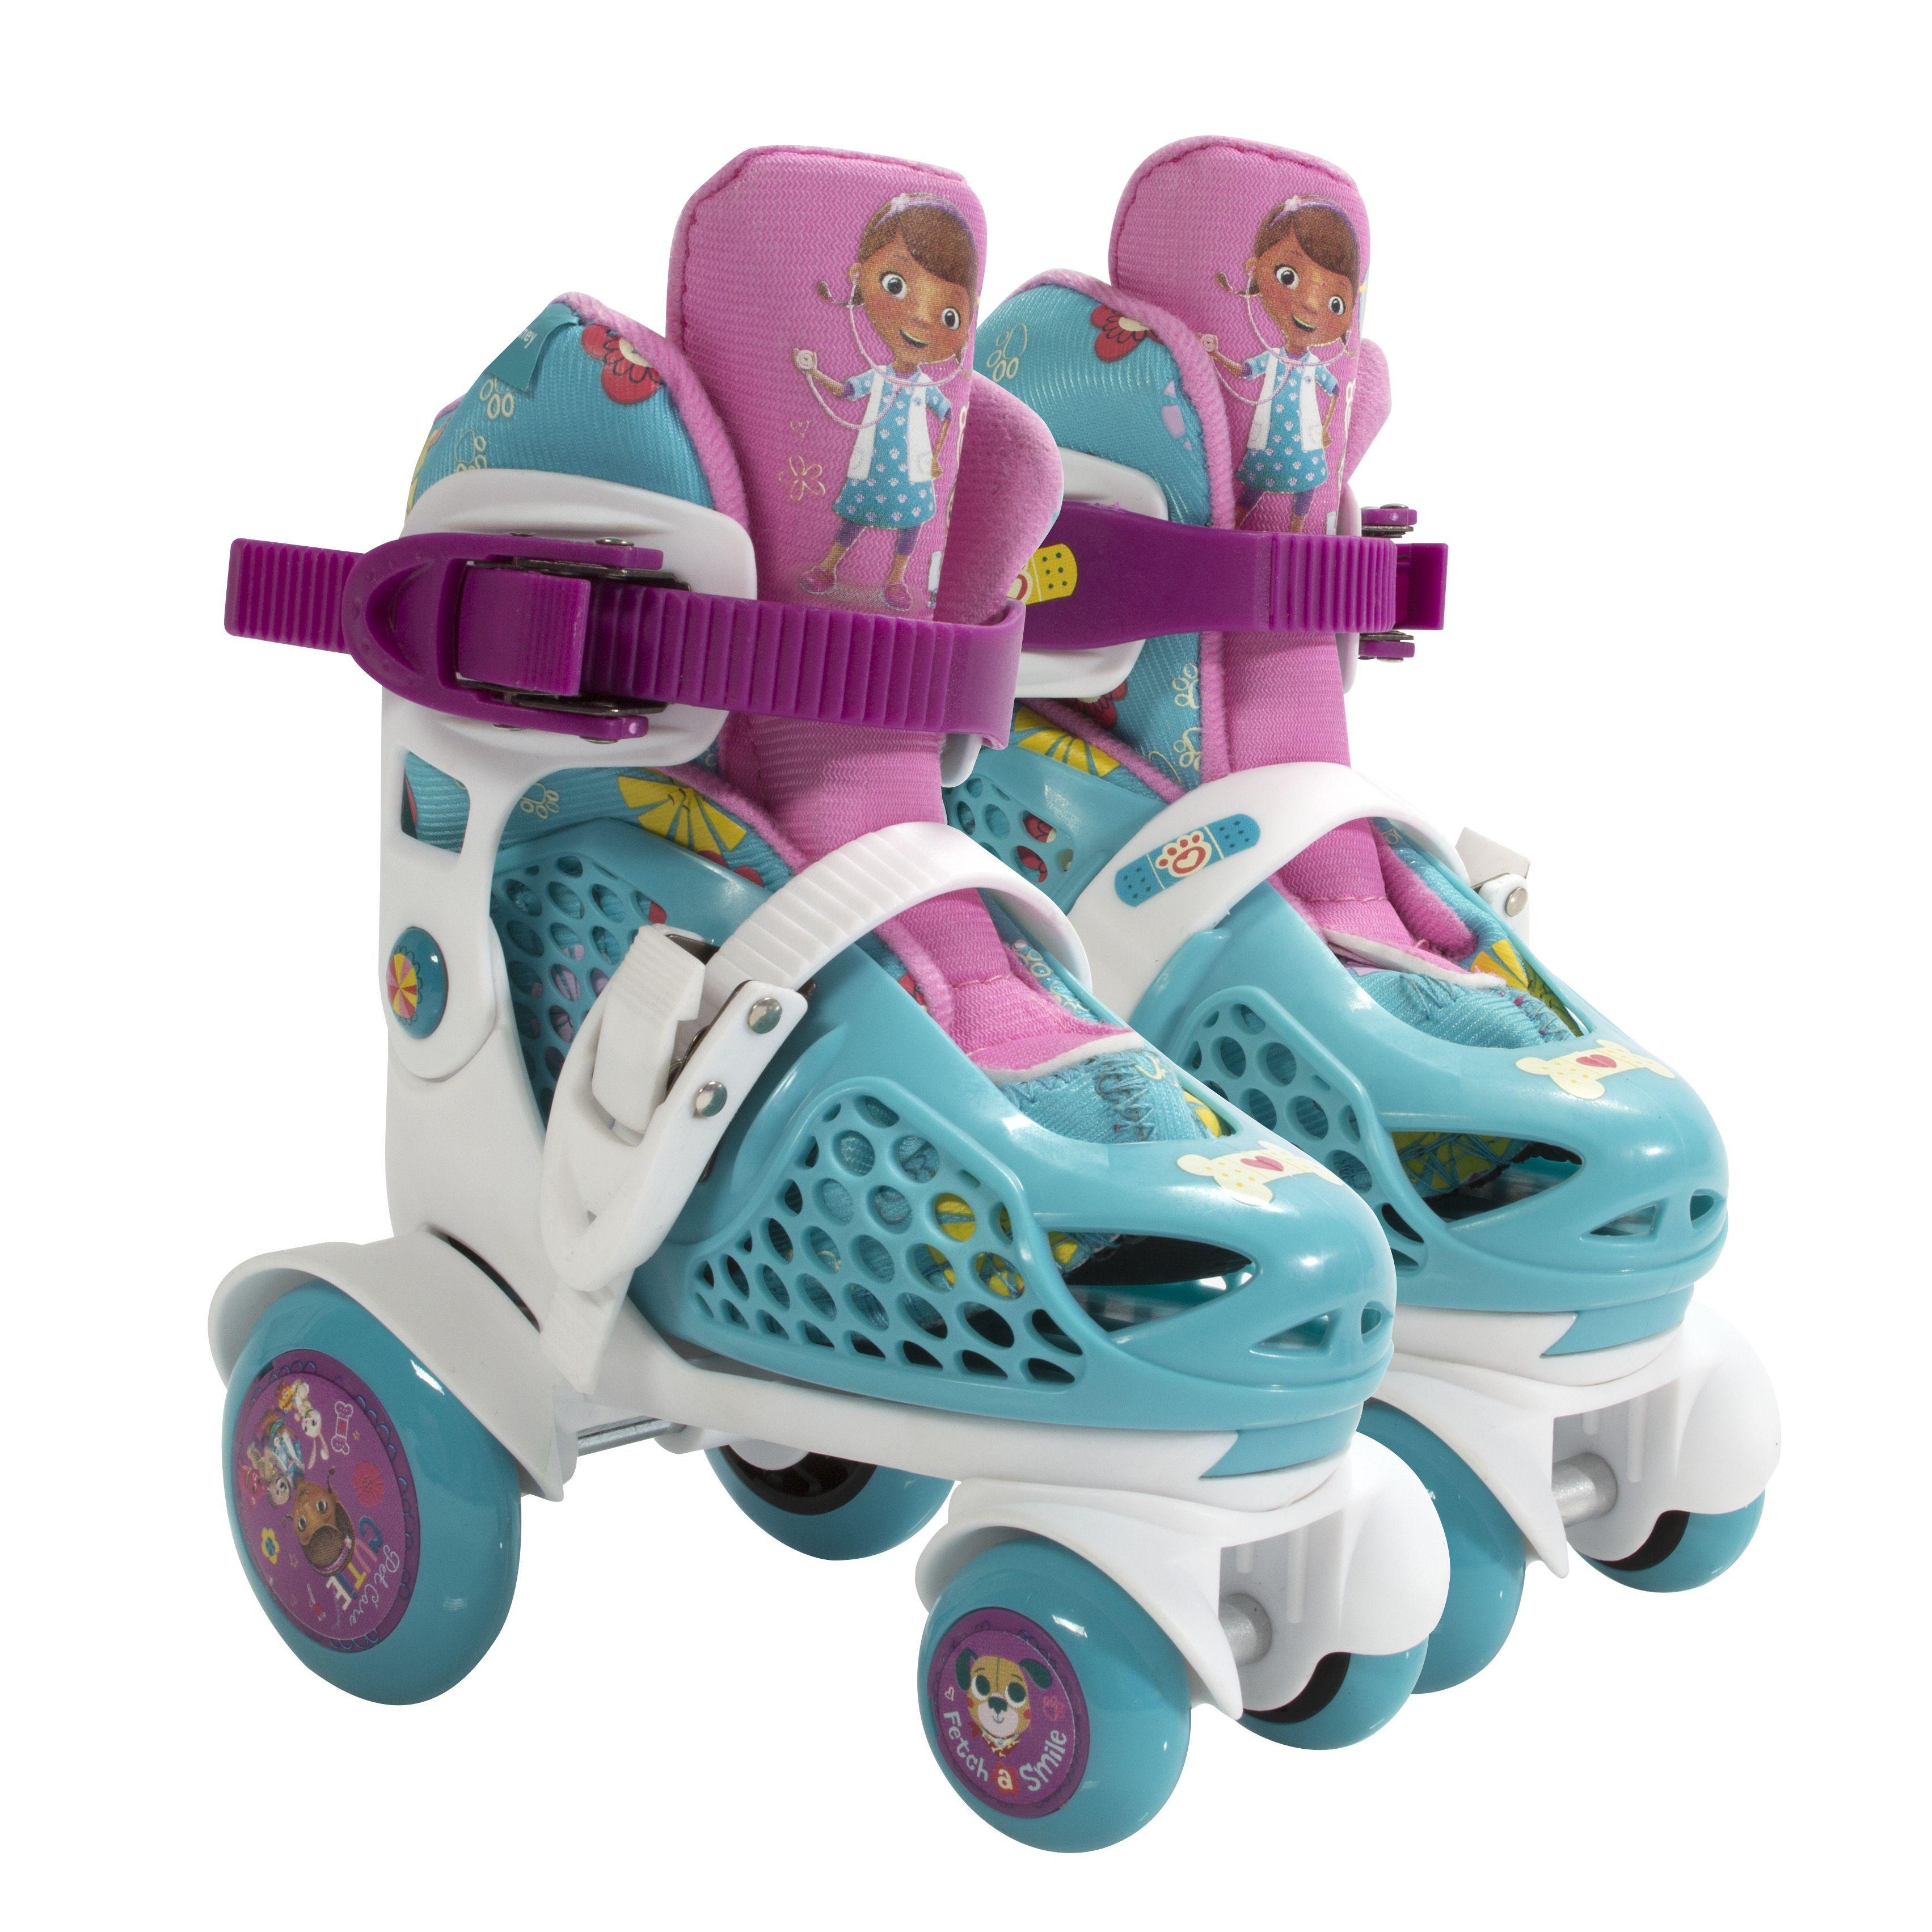 Bravo Playwheels Disney Doc McStuffins Junior Size 6-9 Big Wheel Skates